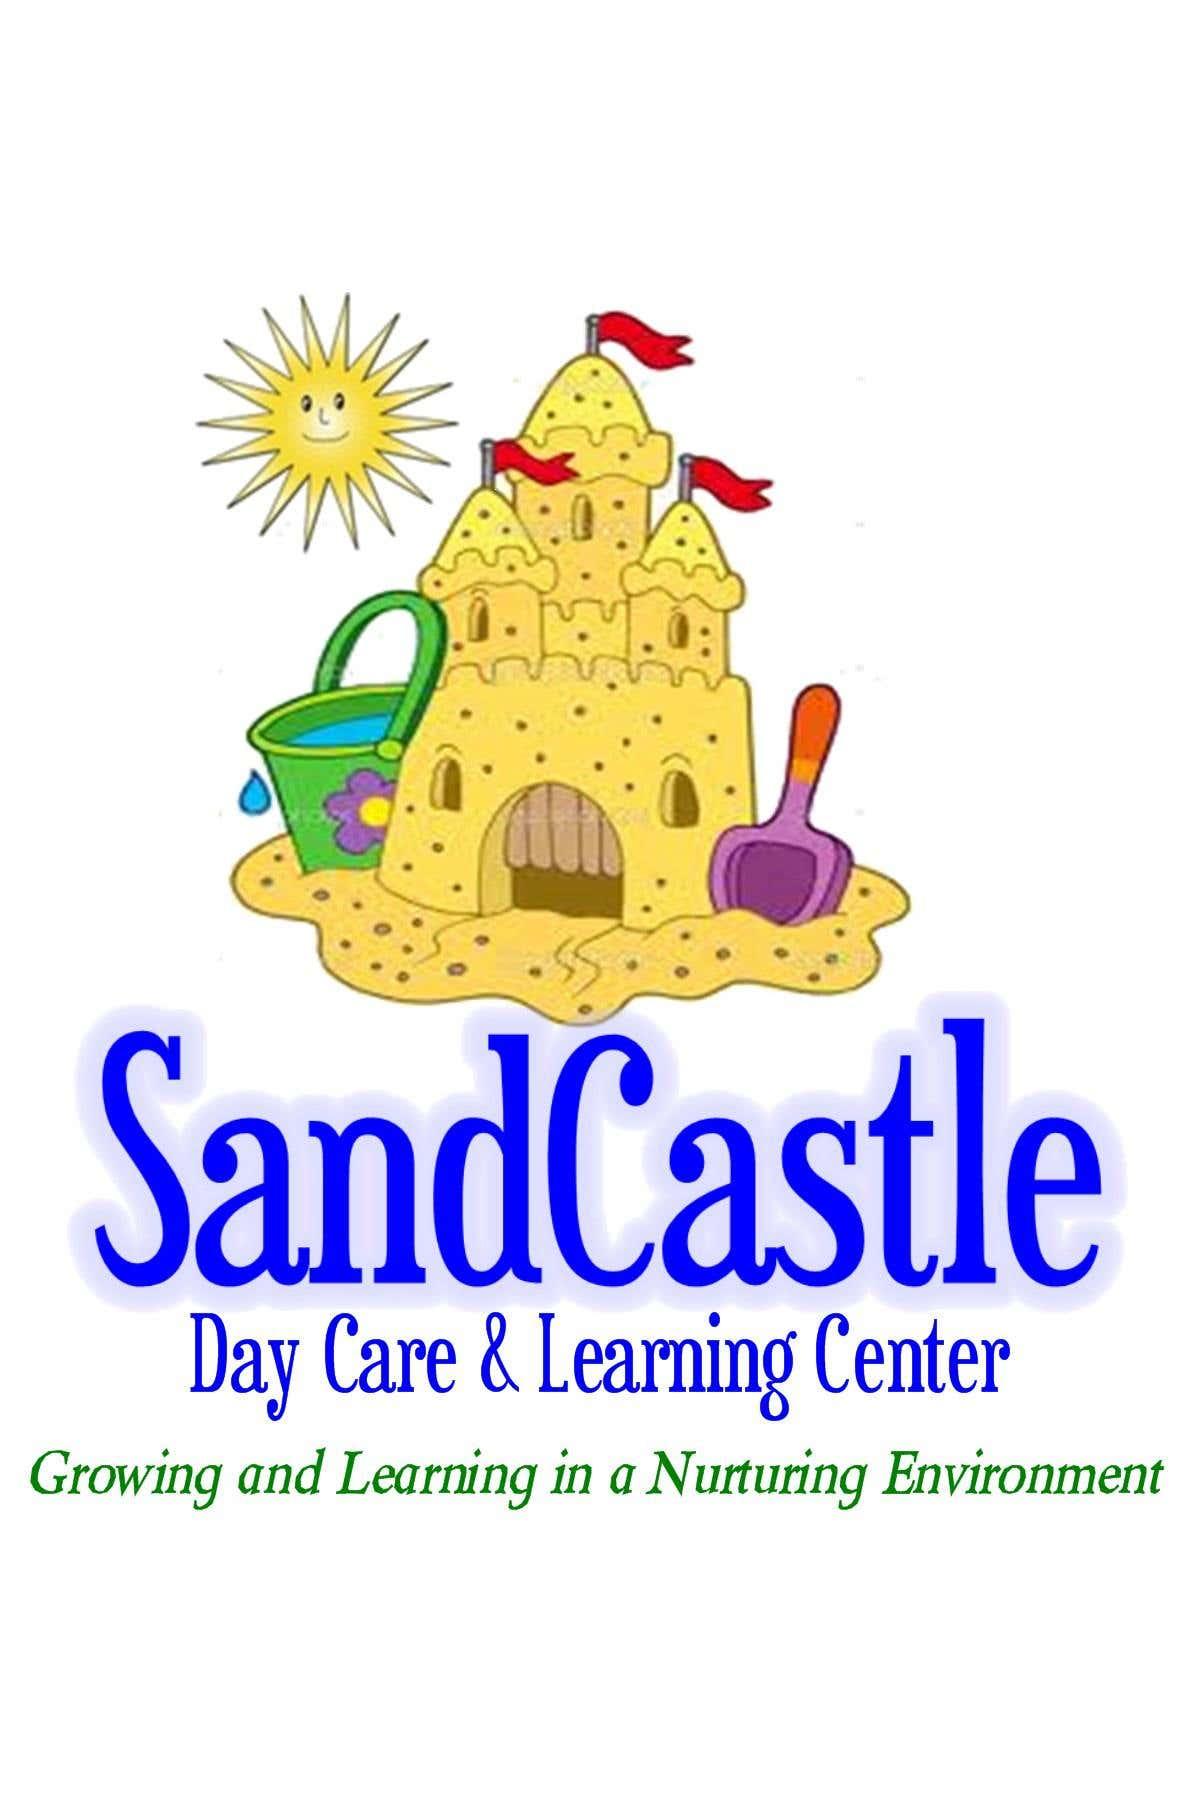 Sandcastle Day Care